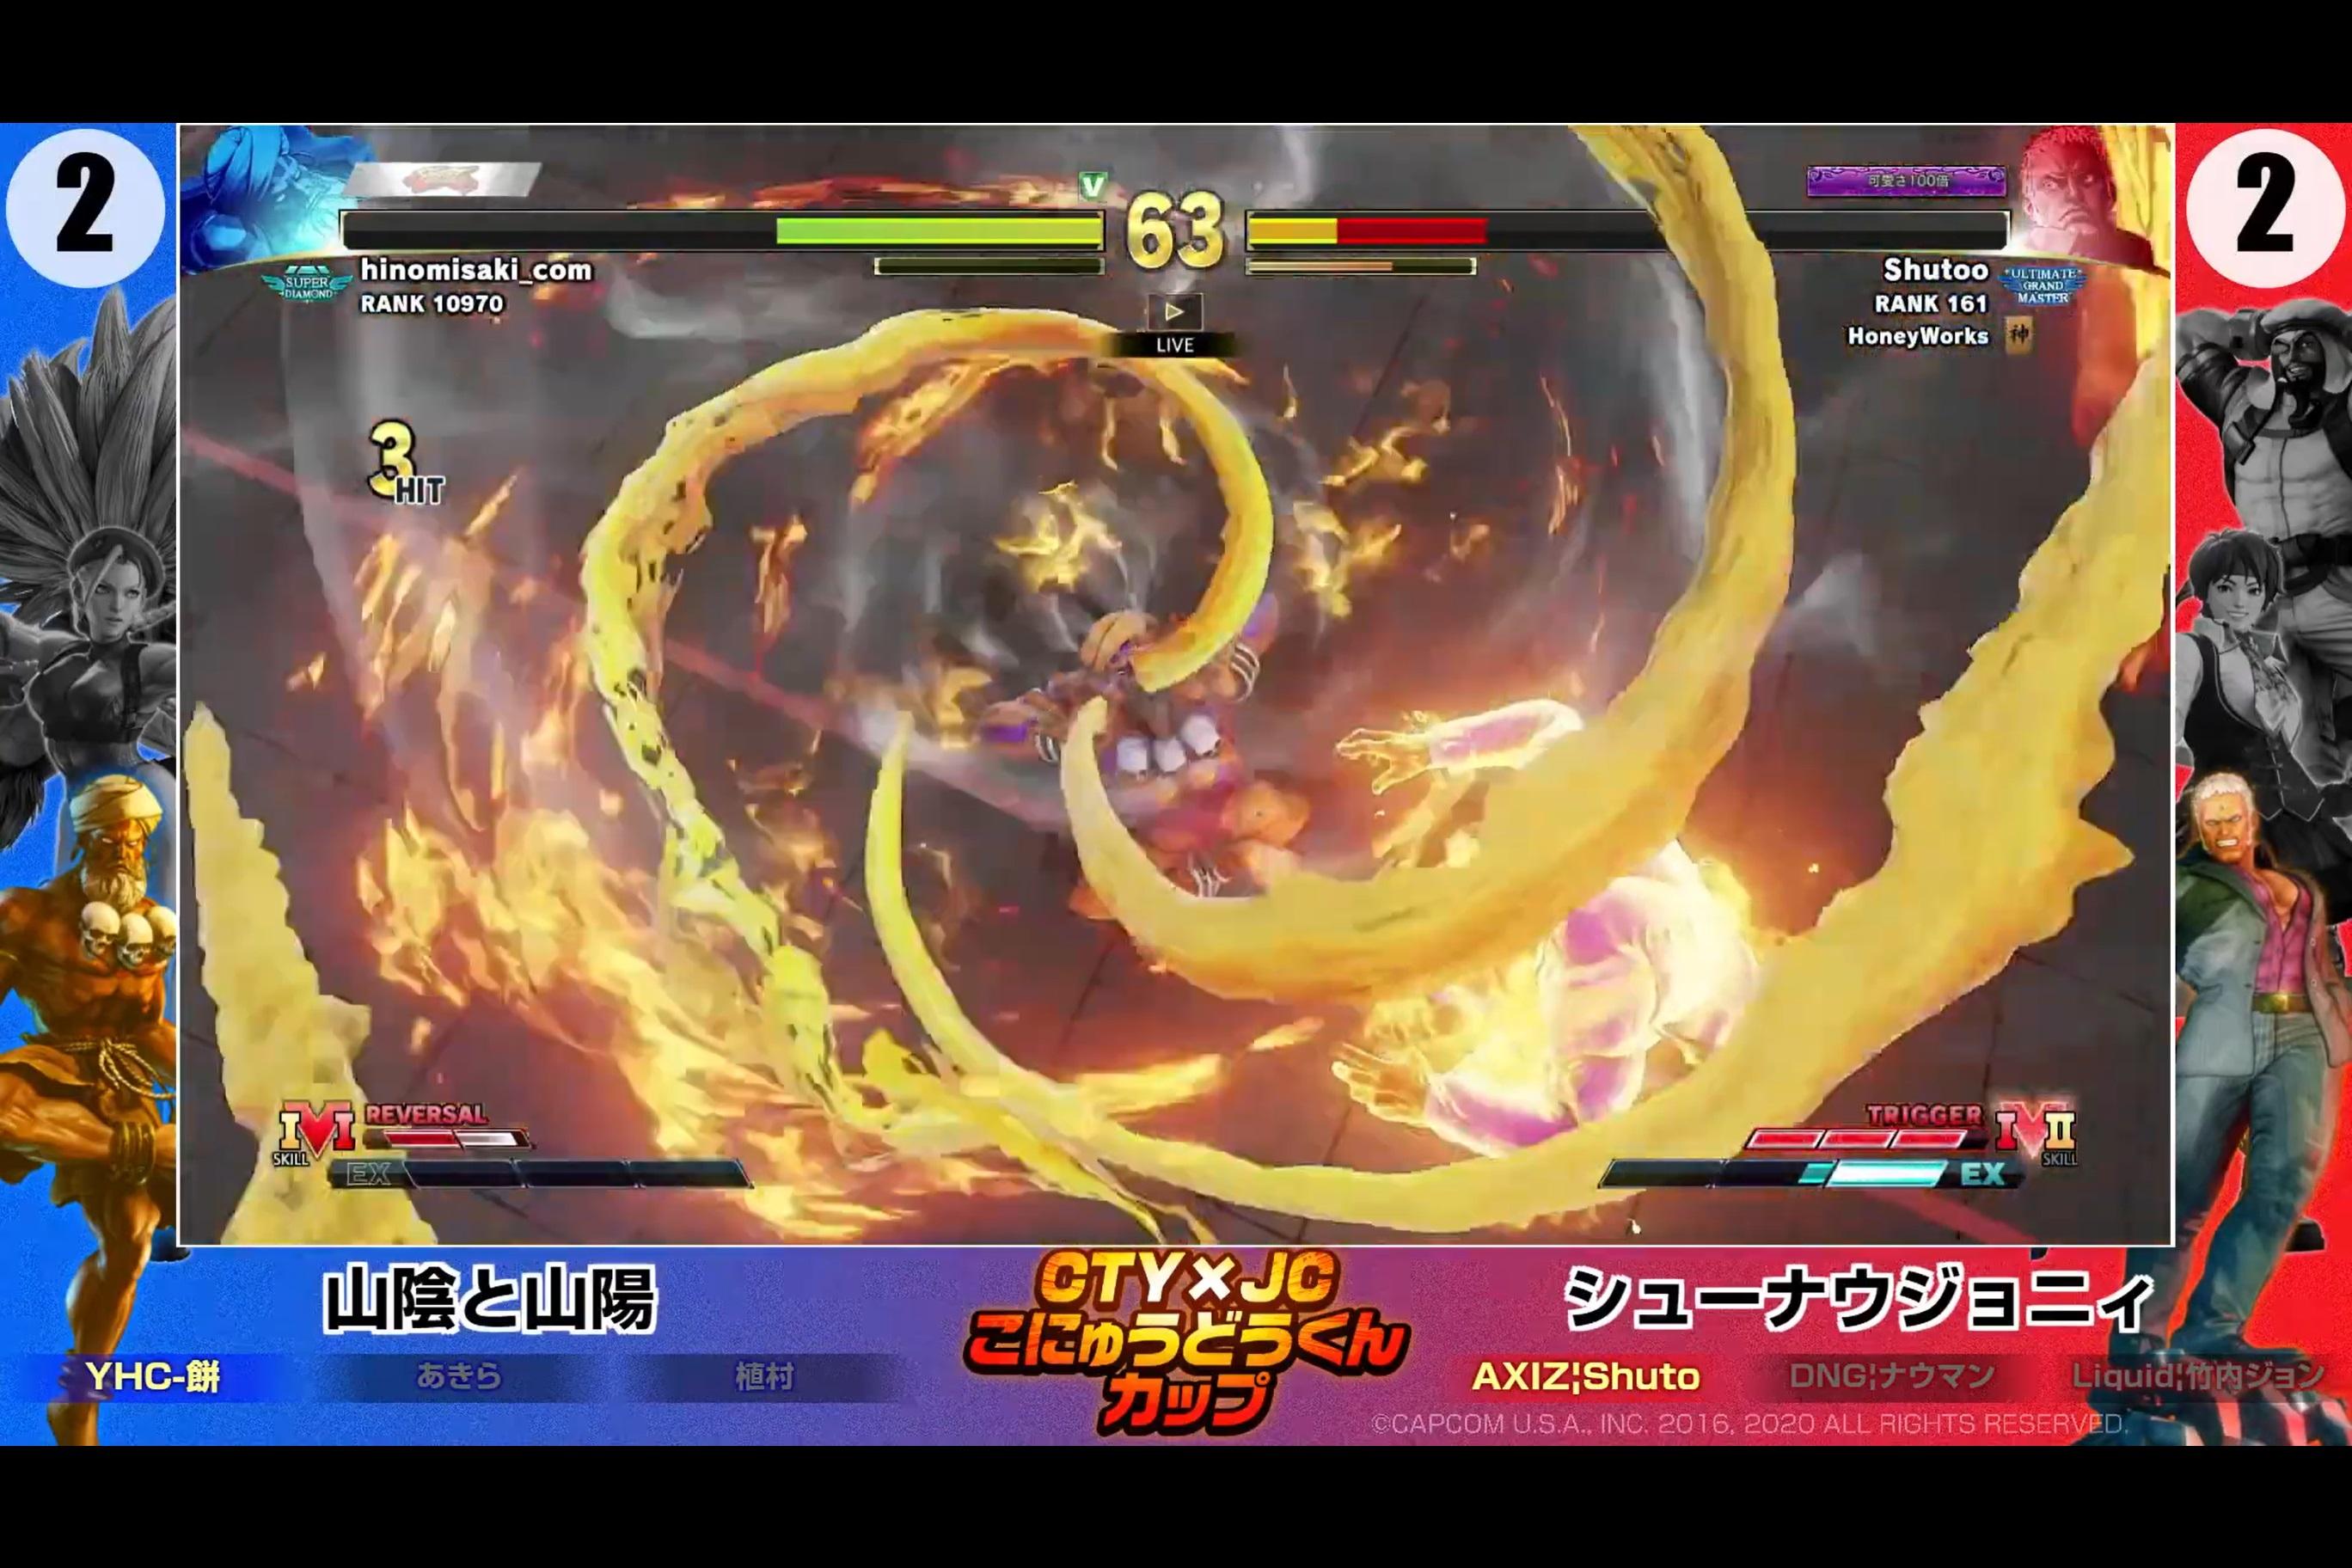 YHC-餅(ダルシム)vs Shuto(ユリアン)の試合。ダルシムのヨガサンバーストが炸裂する